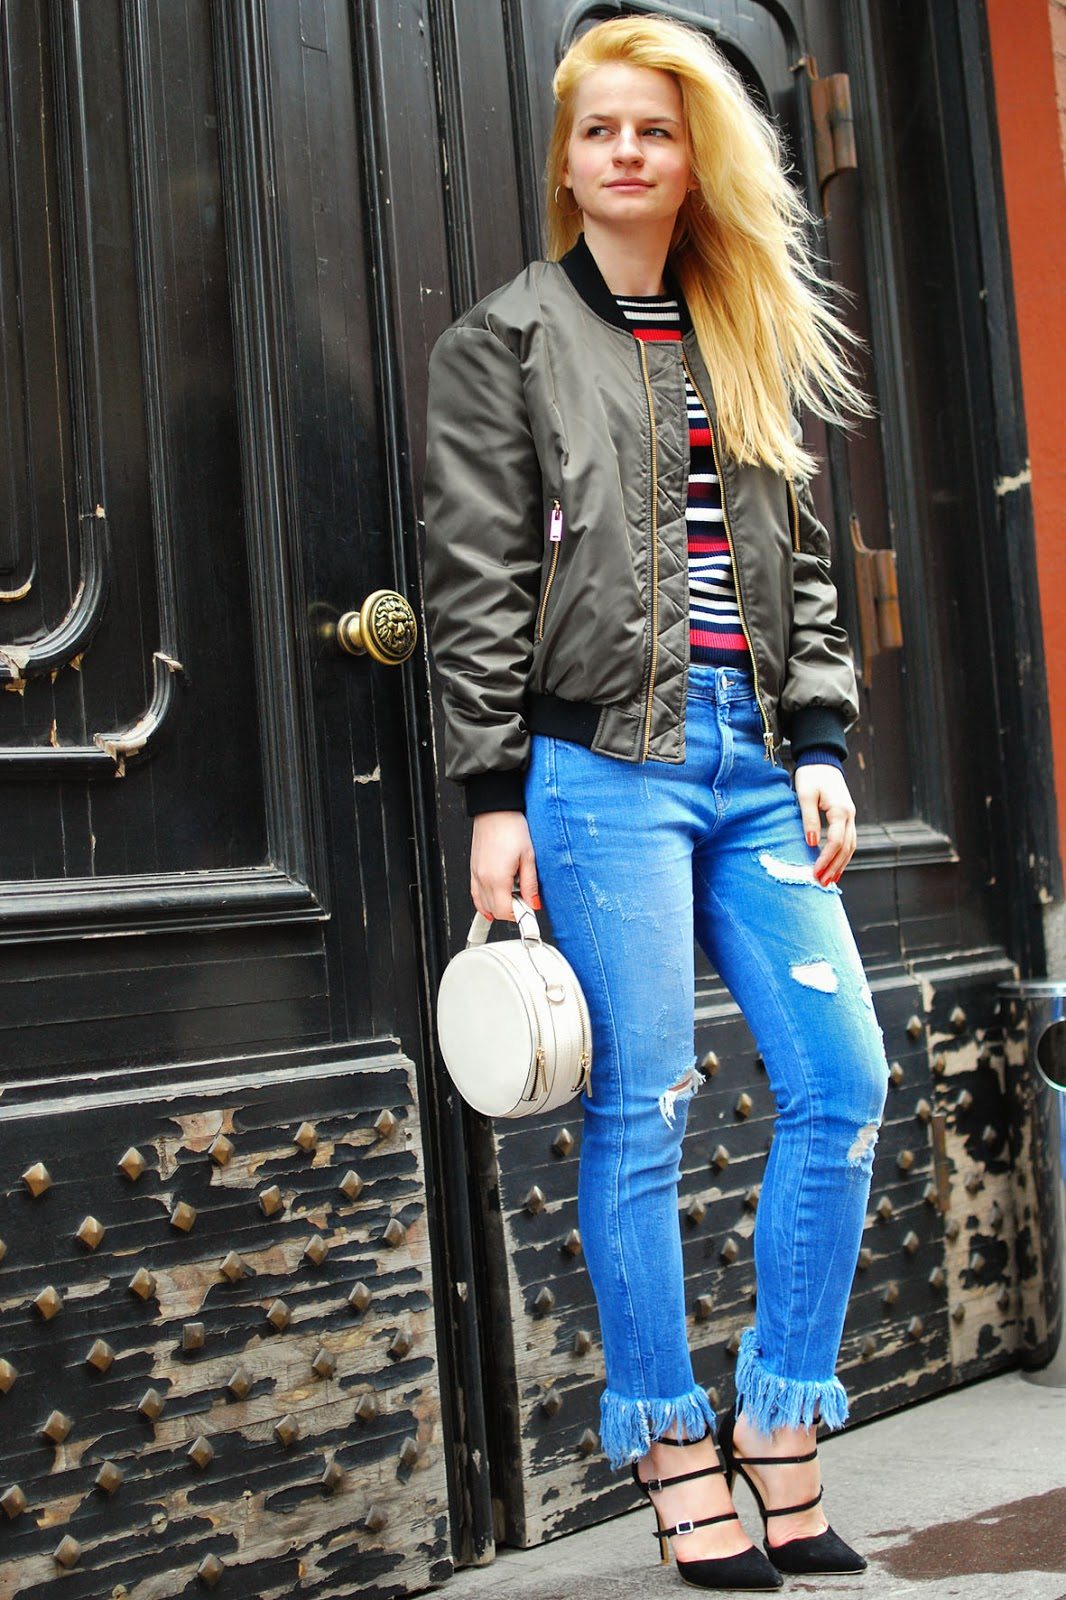 street style jeans ripped, round bags spring 2016 outfit, рваные джинсы с чем носить, бомбер идеи, уличная мода образы 2016